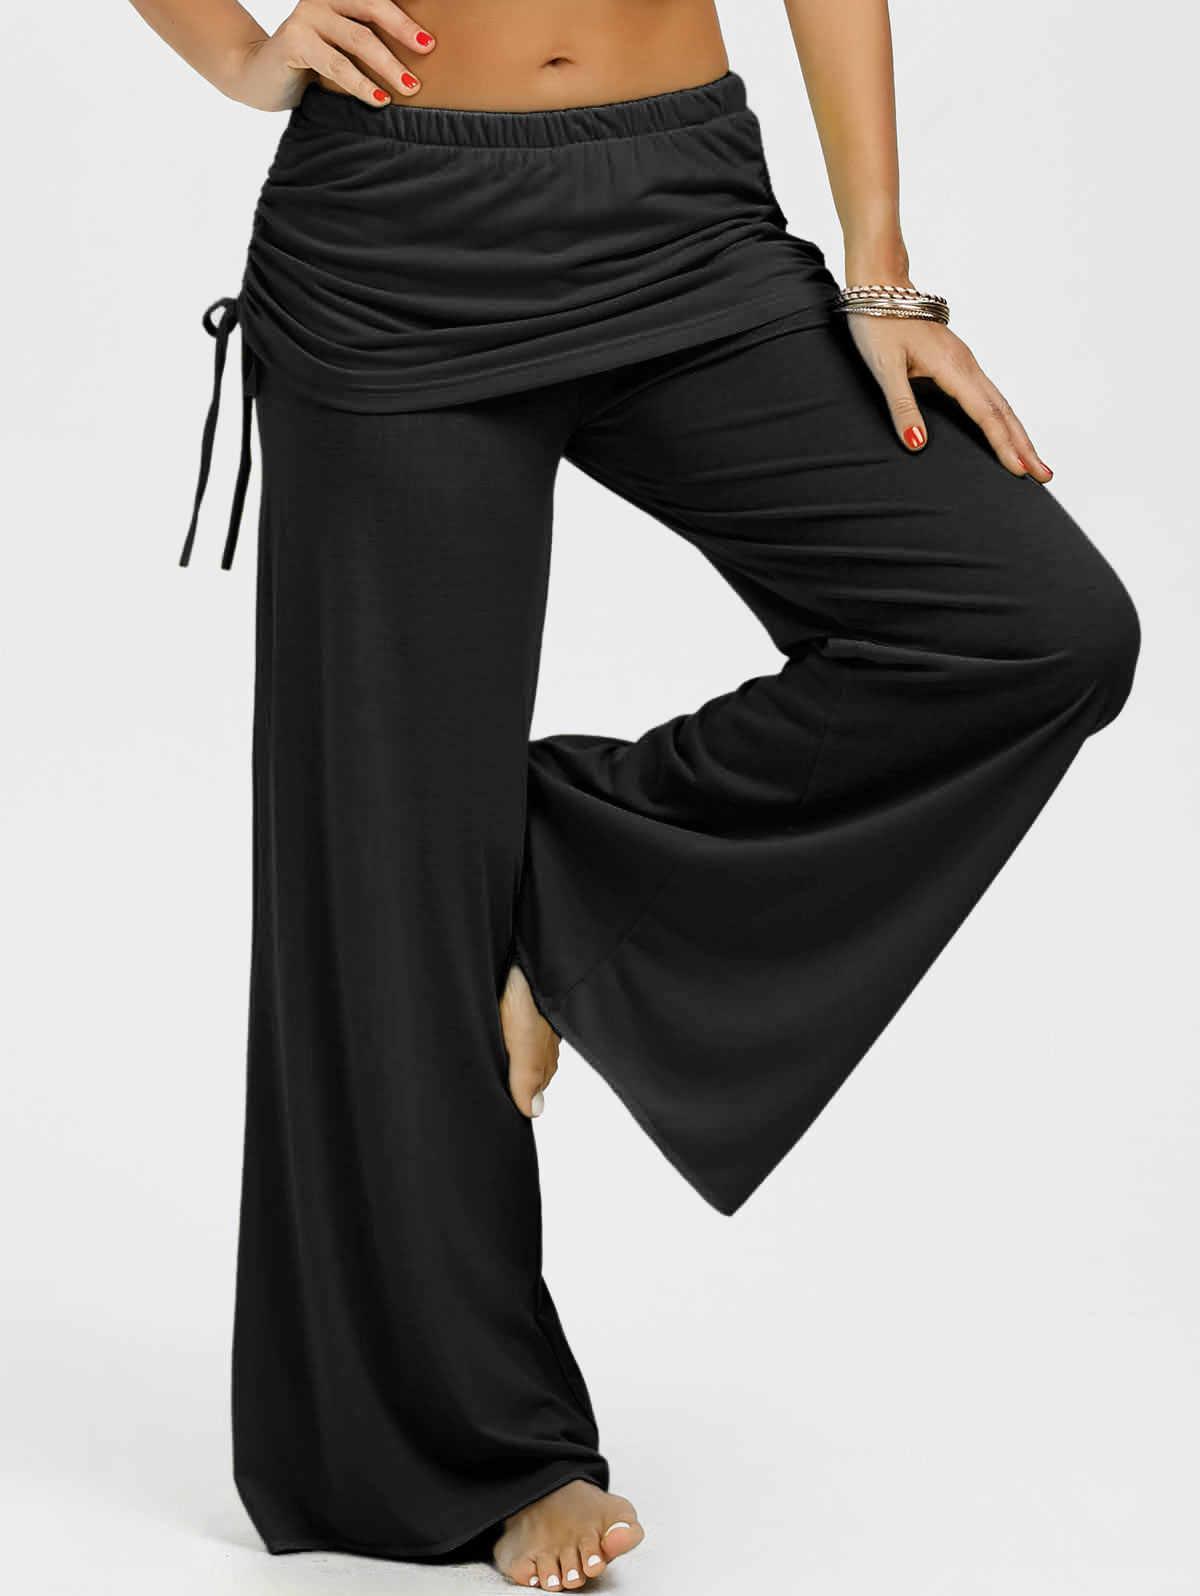 30aac91cdee Wipalo Wide Leg Pants Women Skirt Fly Loose Trousers Women High Waist Self  Belted Box Pleated